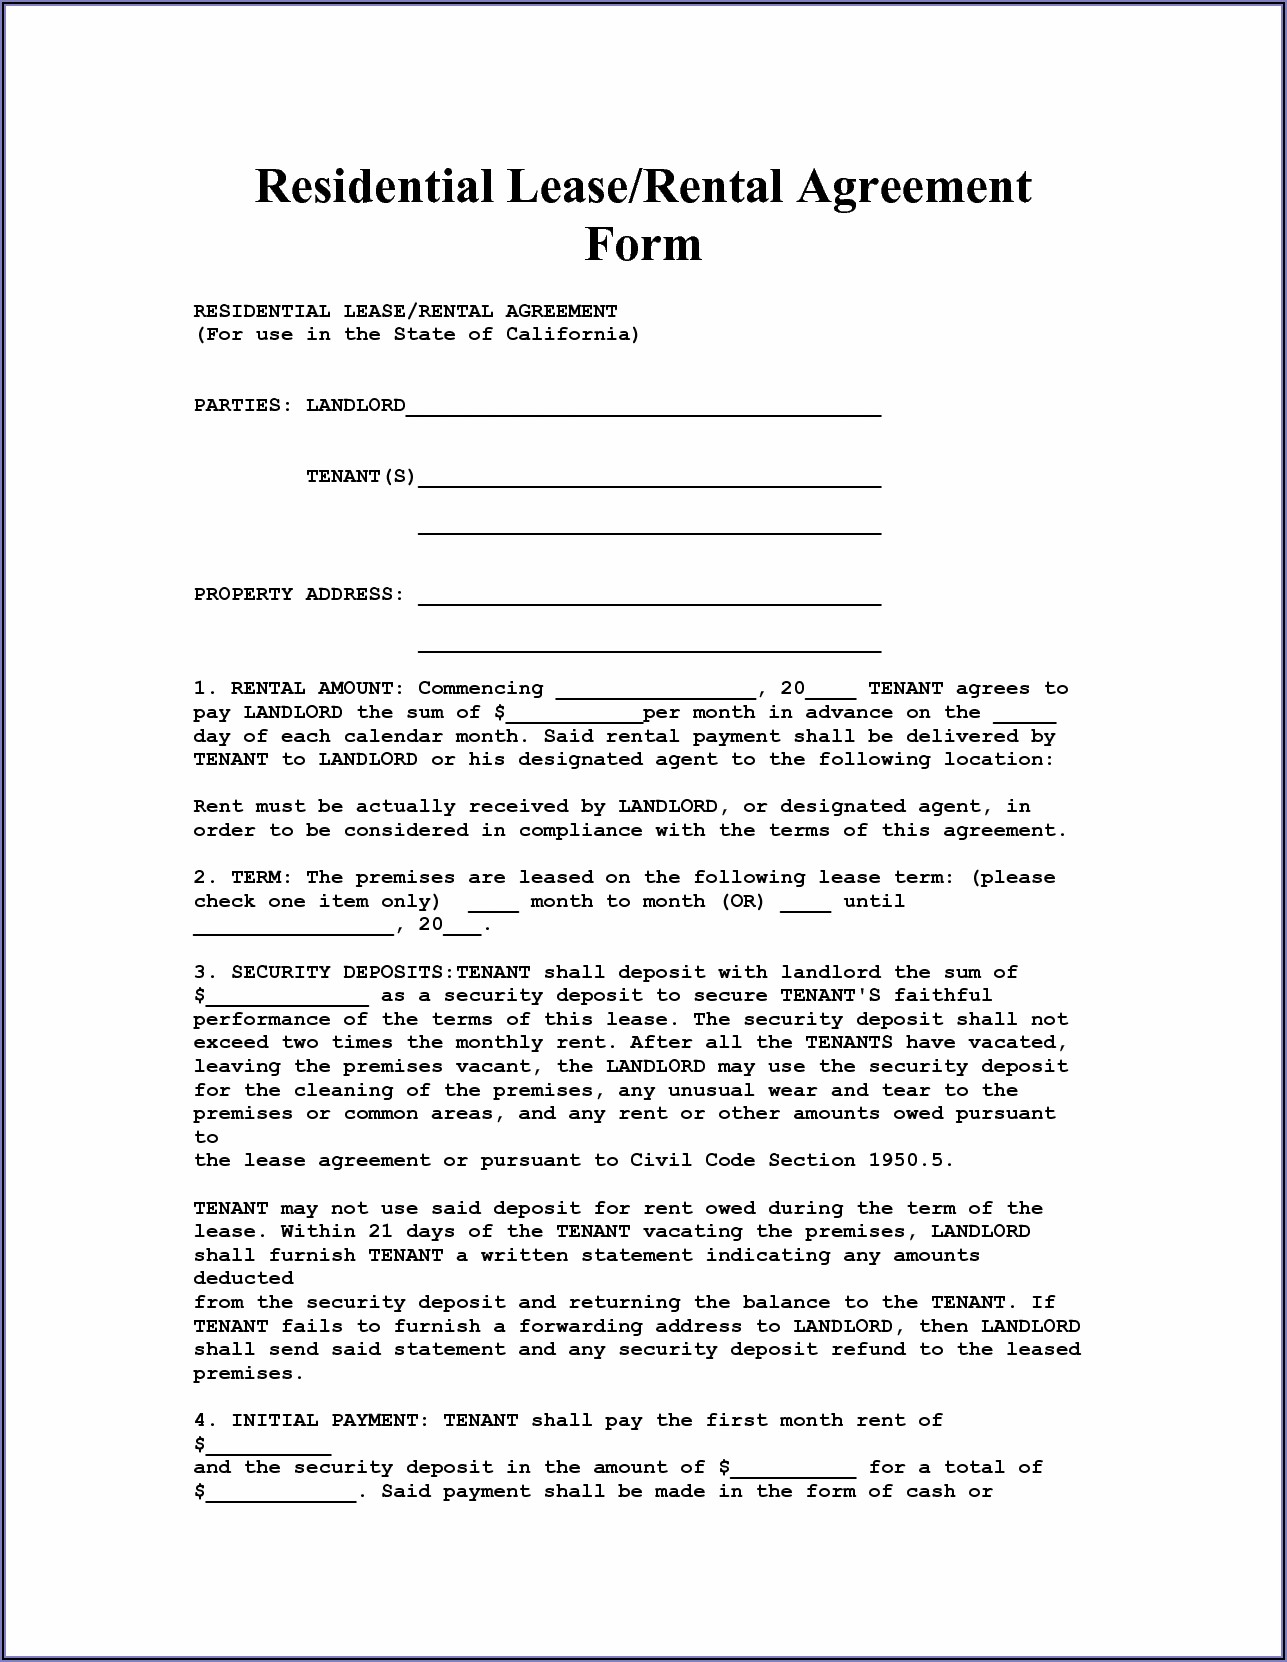 Rental Agreement Form Free Printable